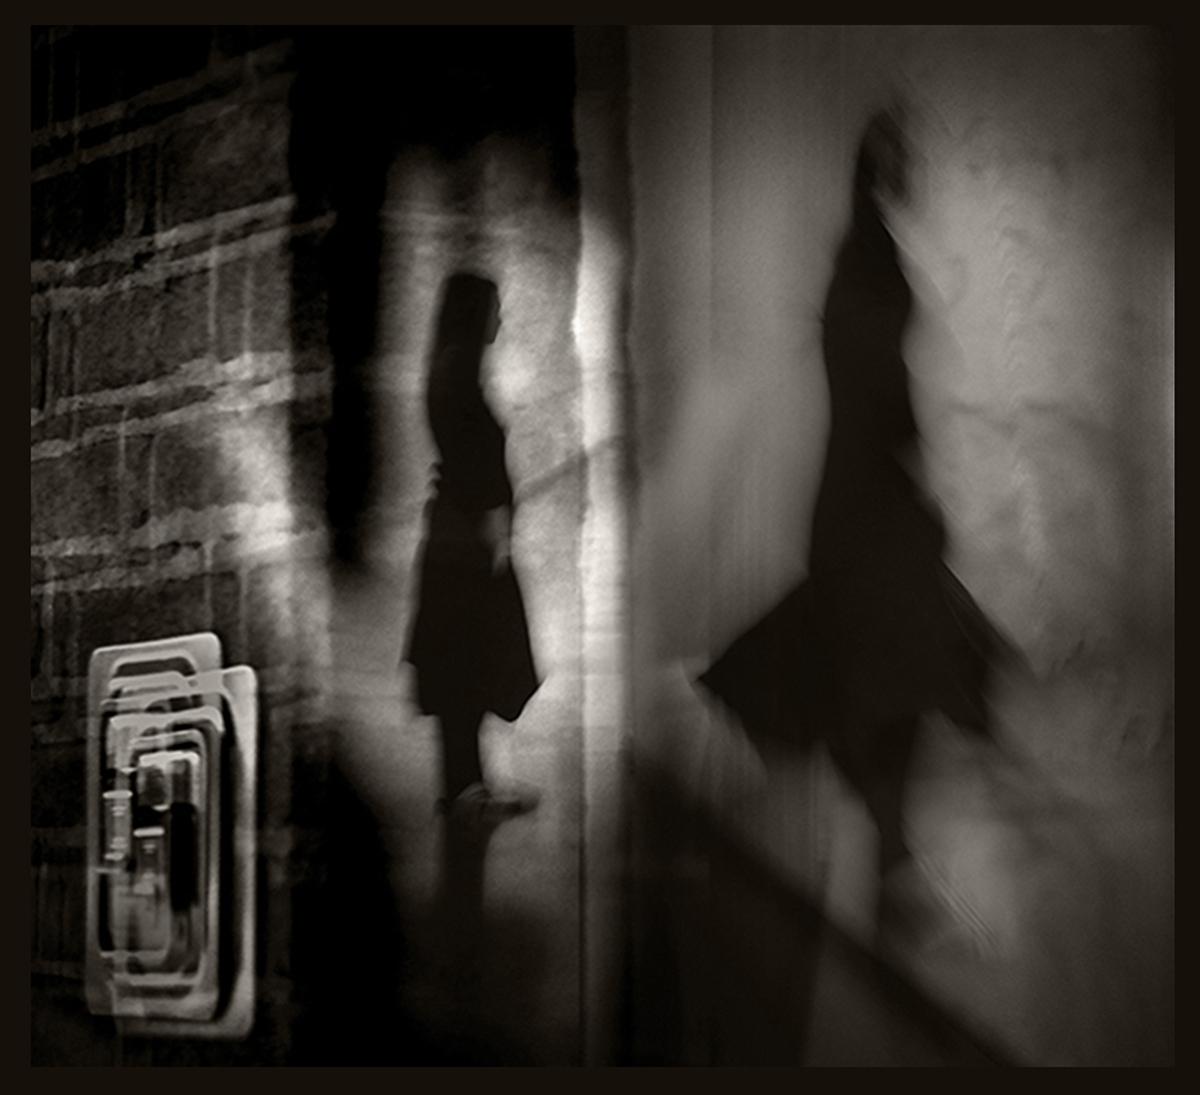 Sara Silks_Studies of Women_Emergence 1.jpg